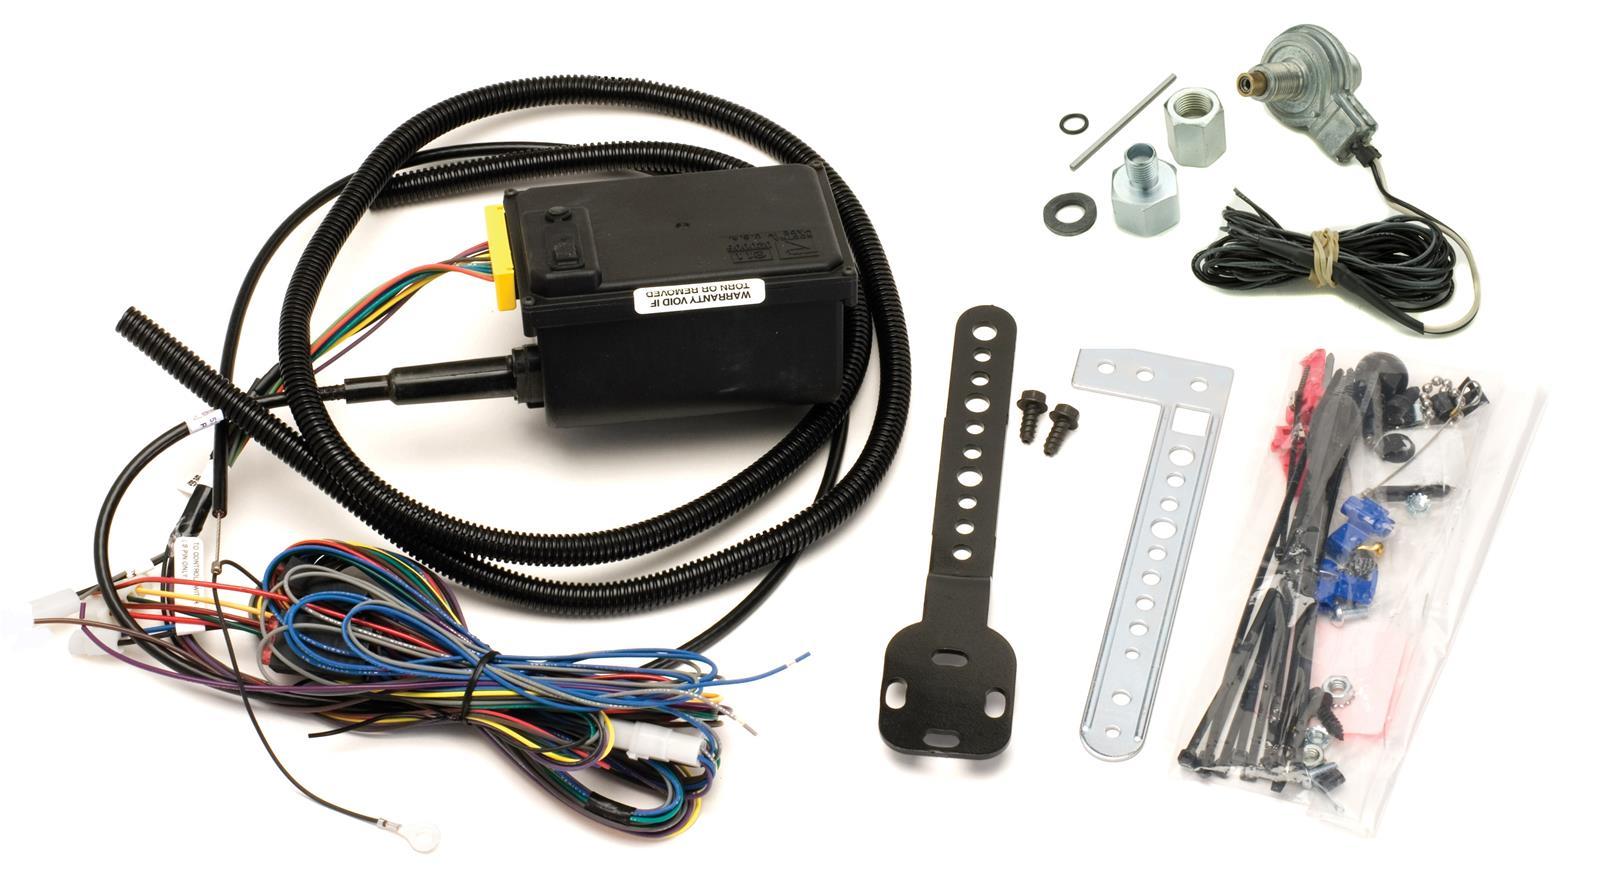 2000 Peterbilt Cruise Control Switch Diagram Expert Schematics Saab Dakota Digital Kits For Cable Driven Speedometers Crs Brake Light